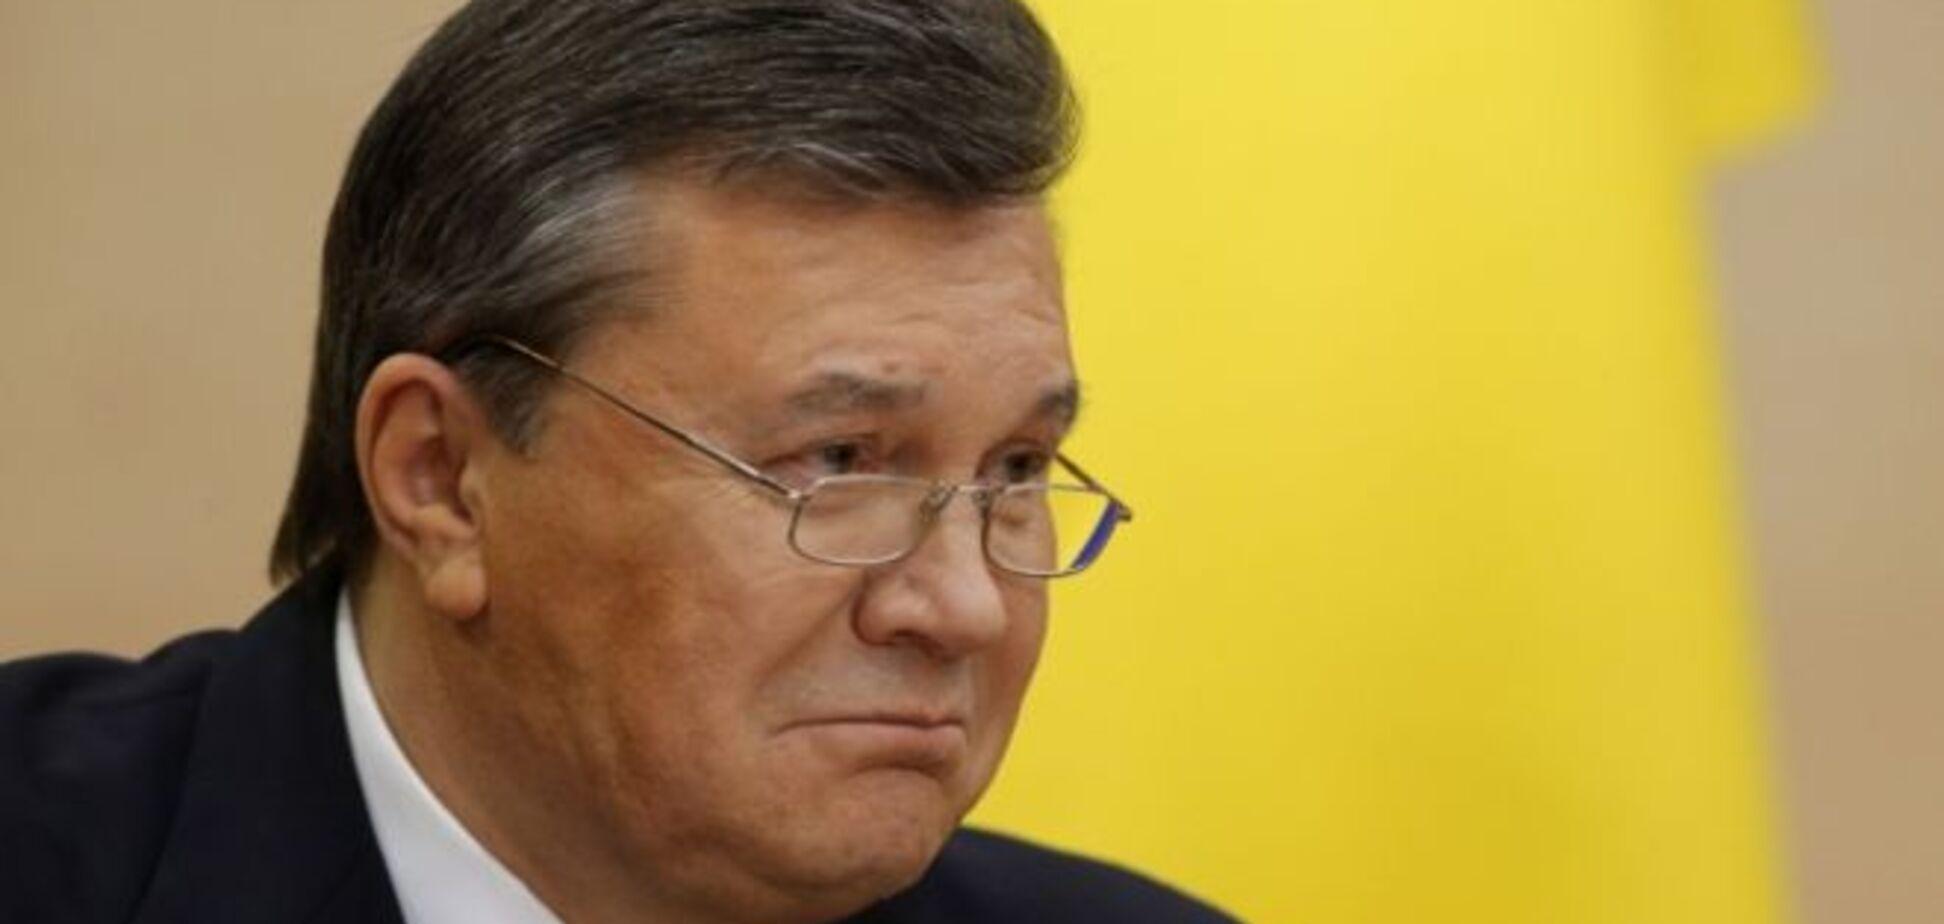 В Швейцарии назвали условия возврата Украине денег 'семьи' Януковича